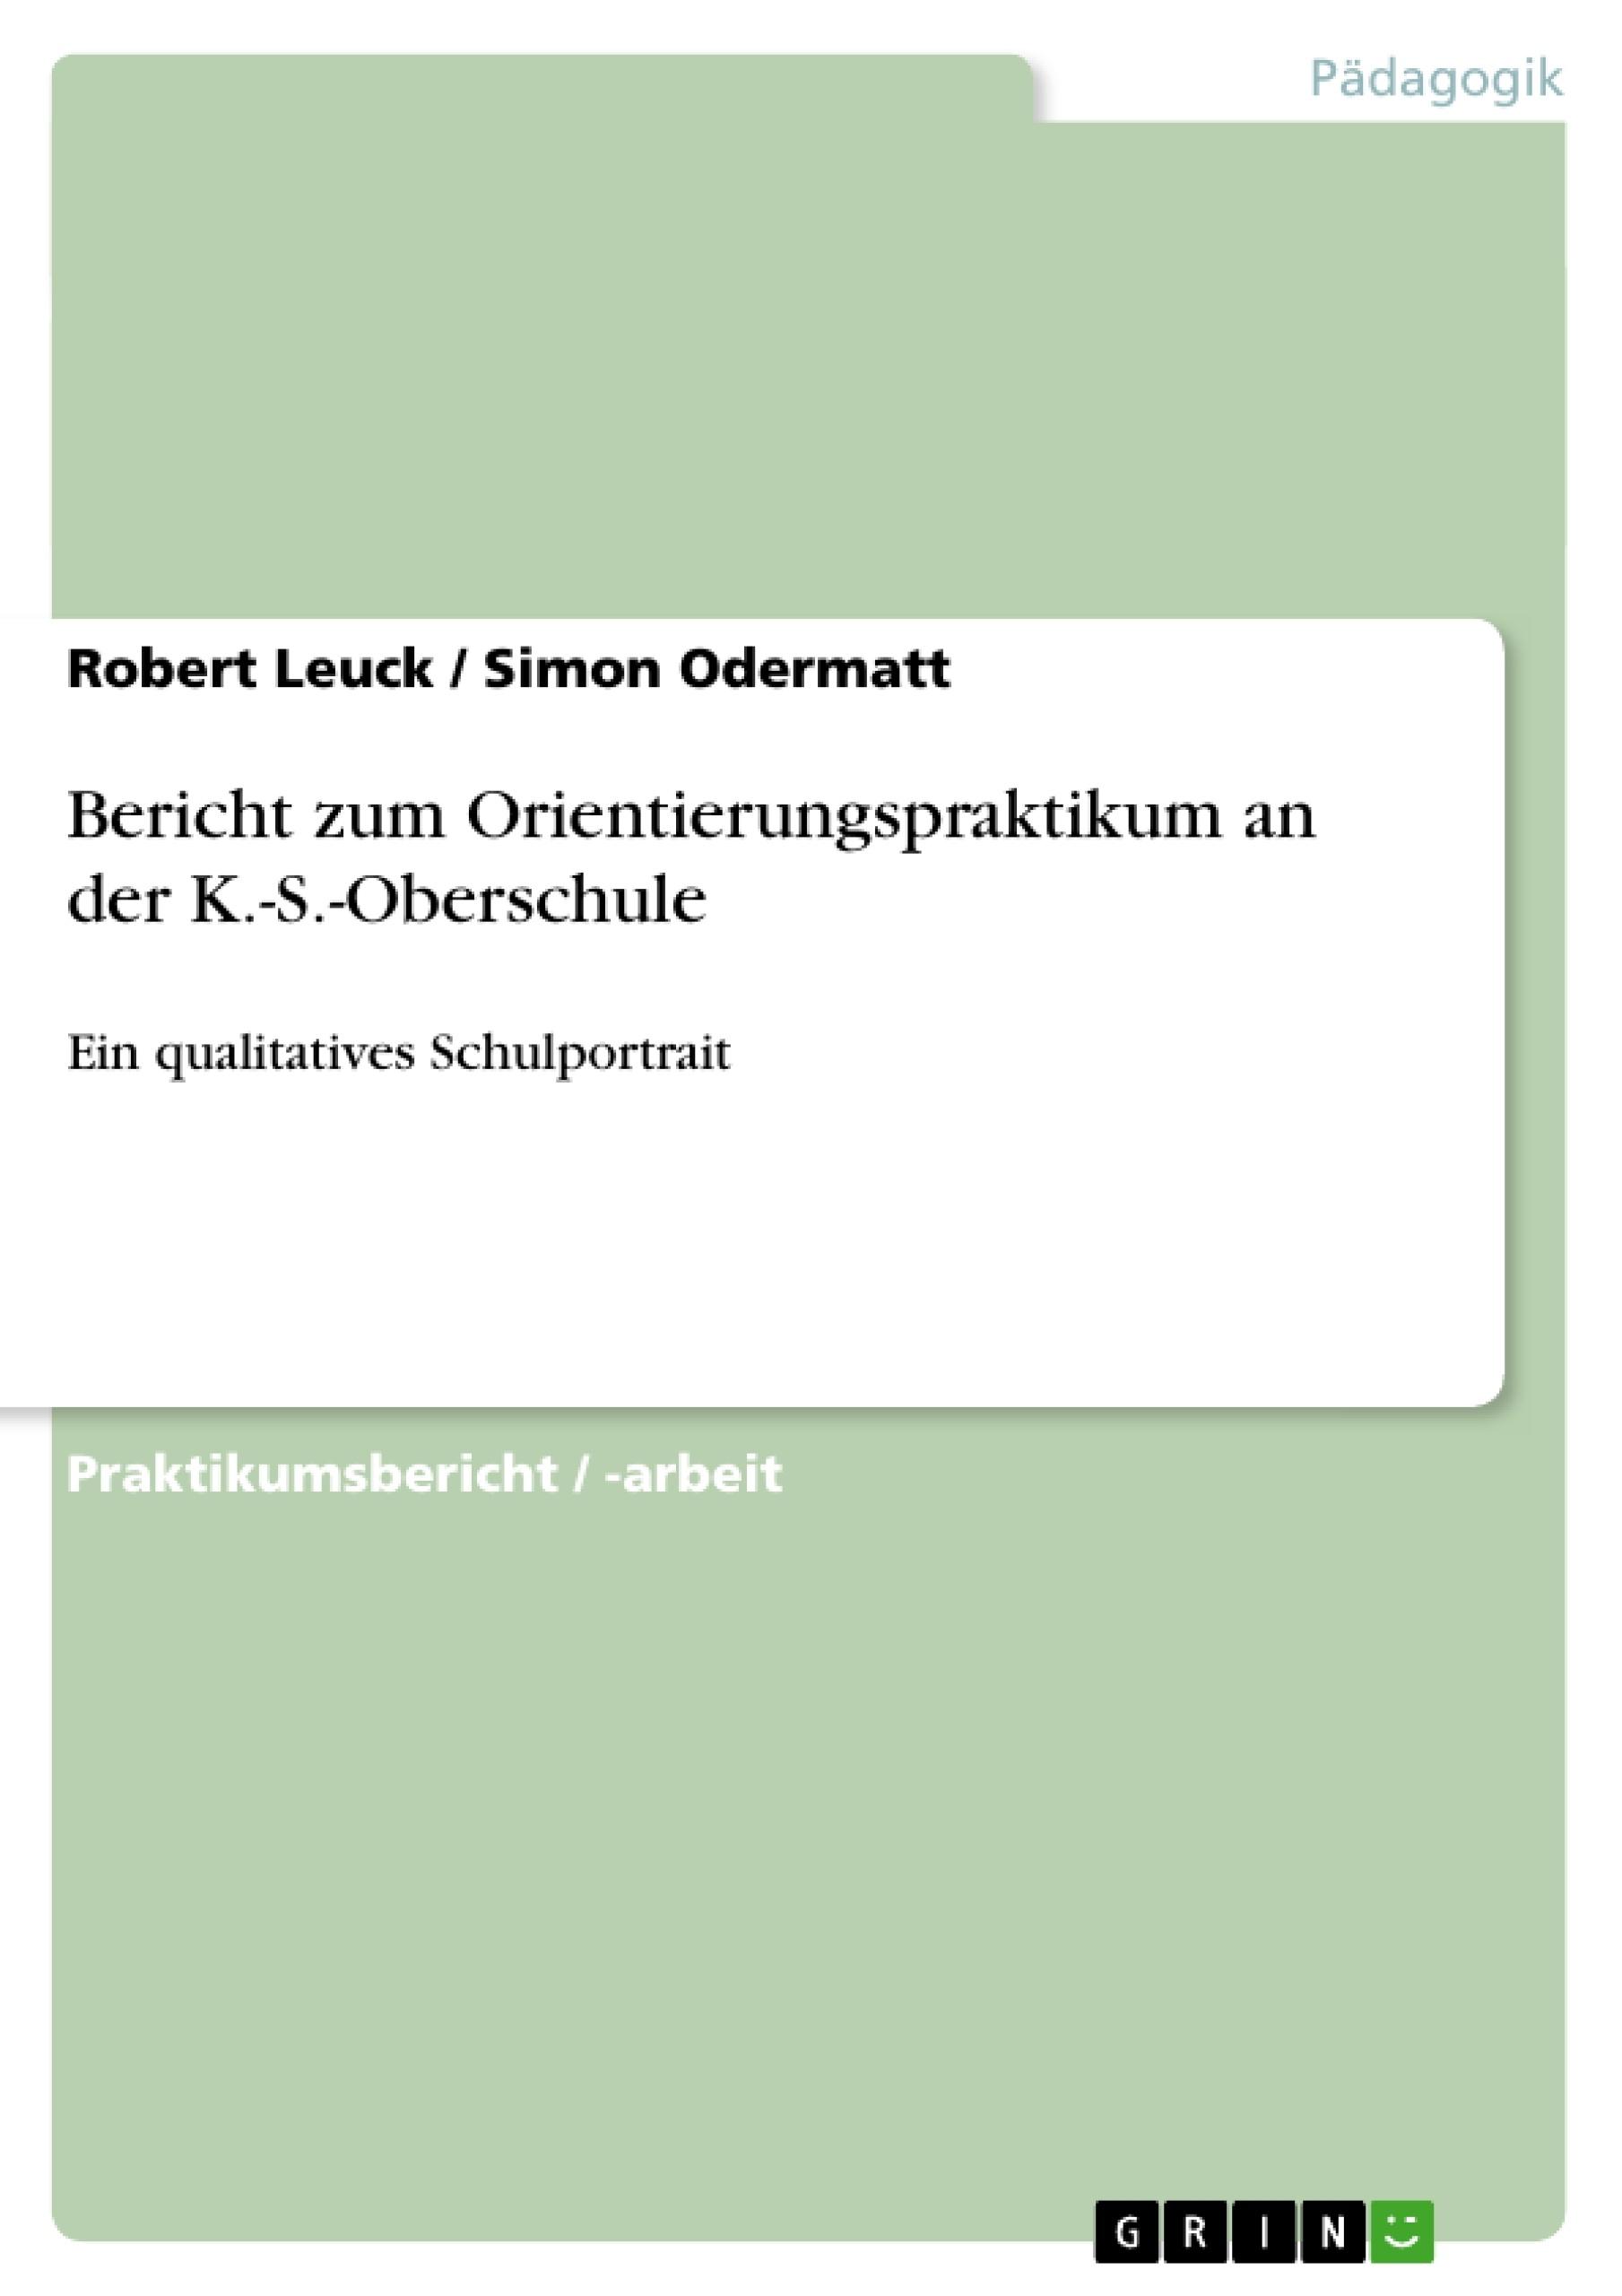 Titel: Bericht zum Orientierungspraktikum an der K.-S.-Oberschule